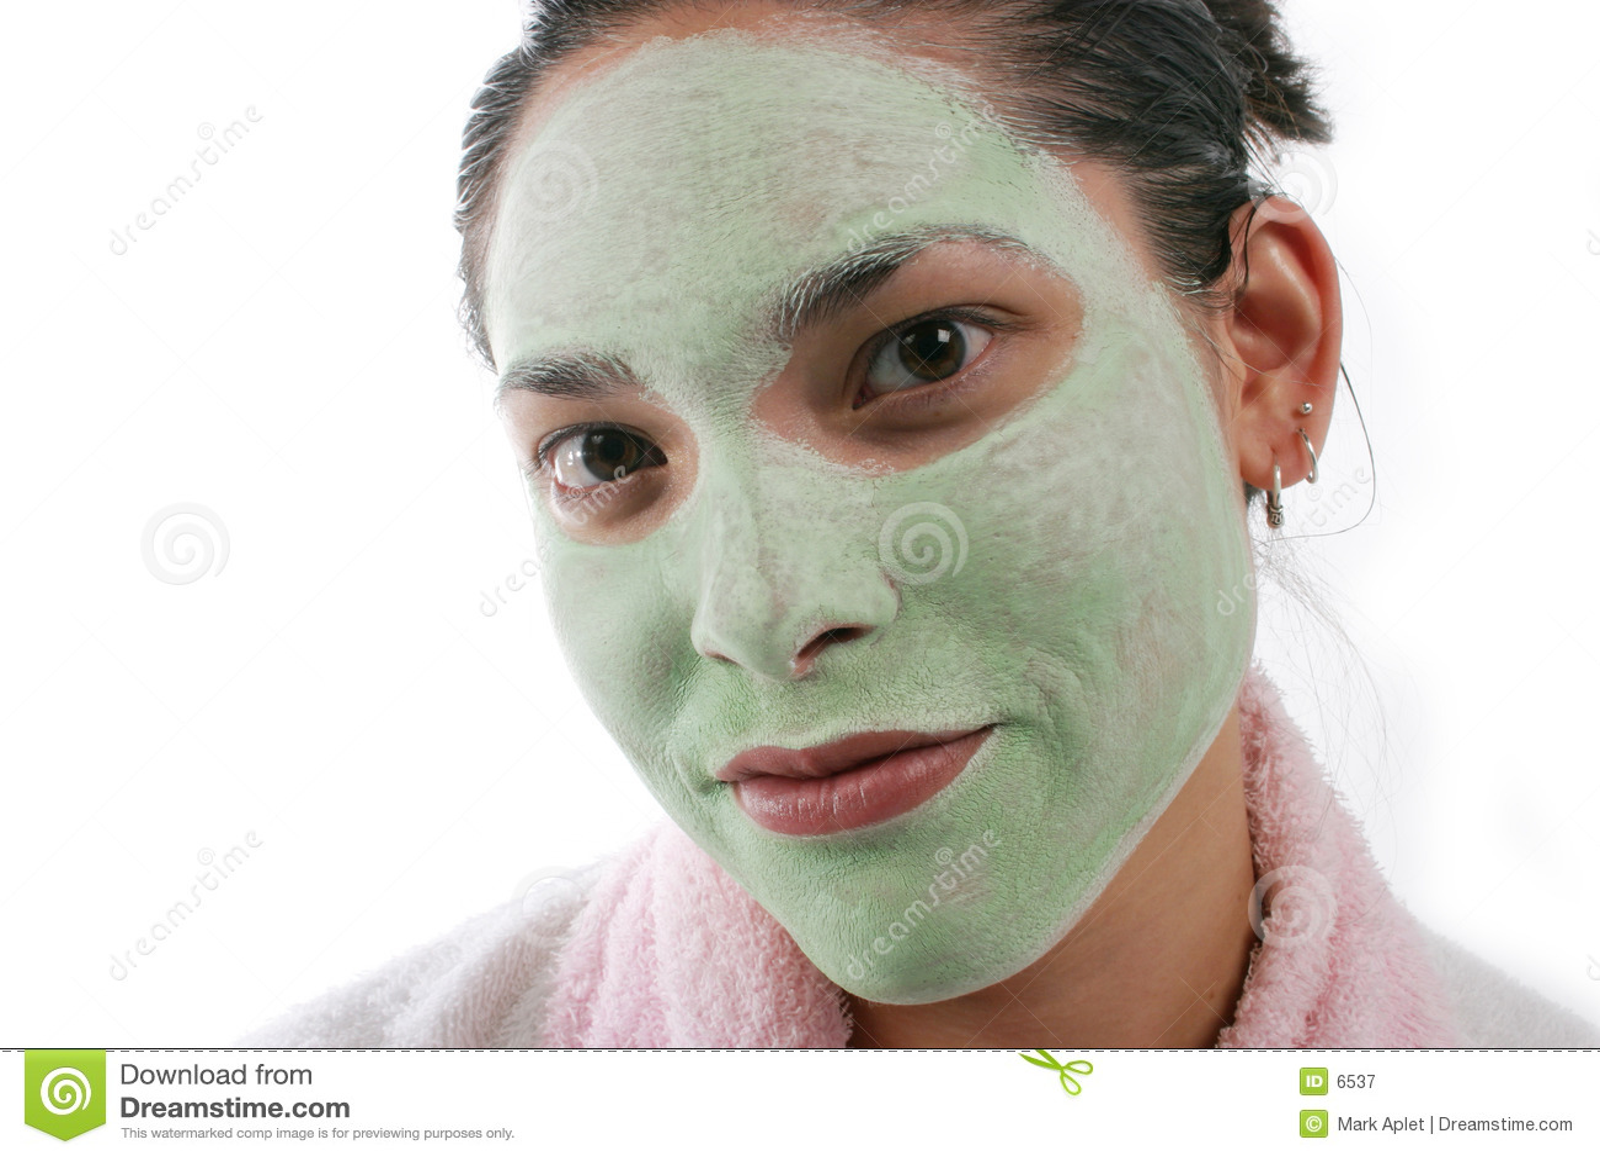 Spa and facial